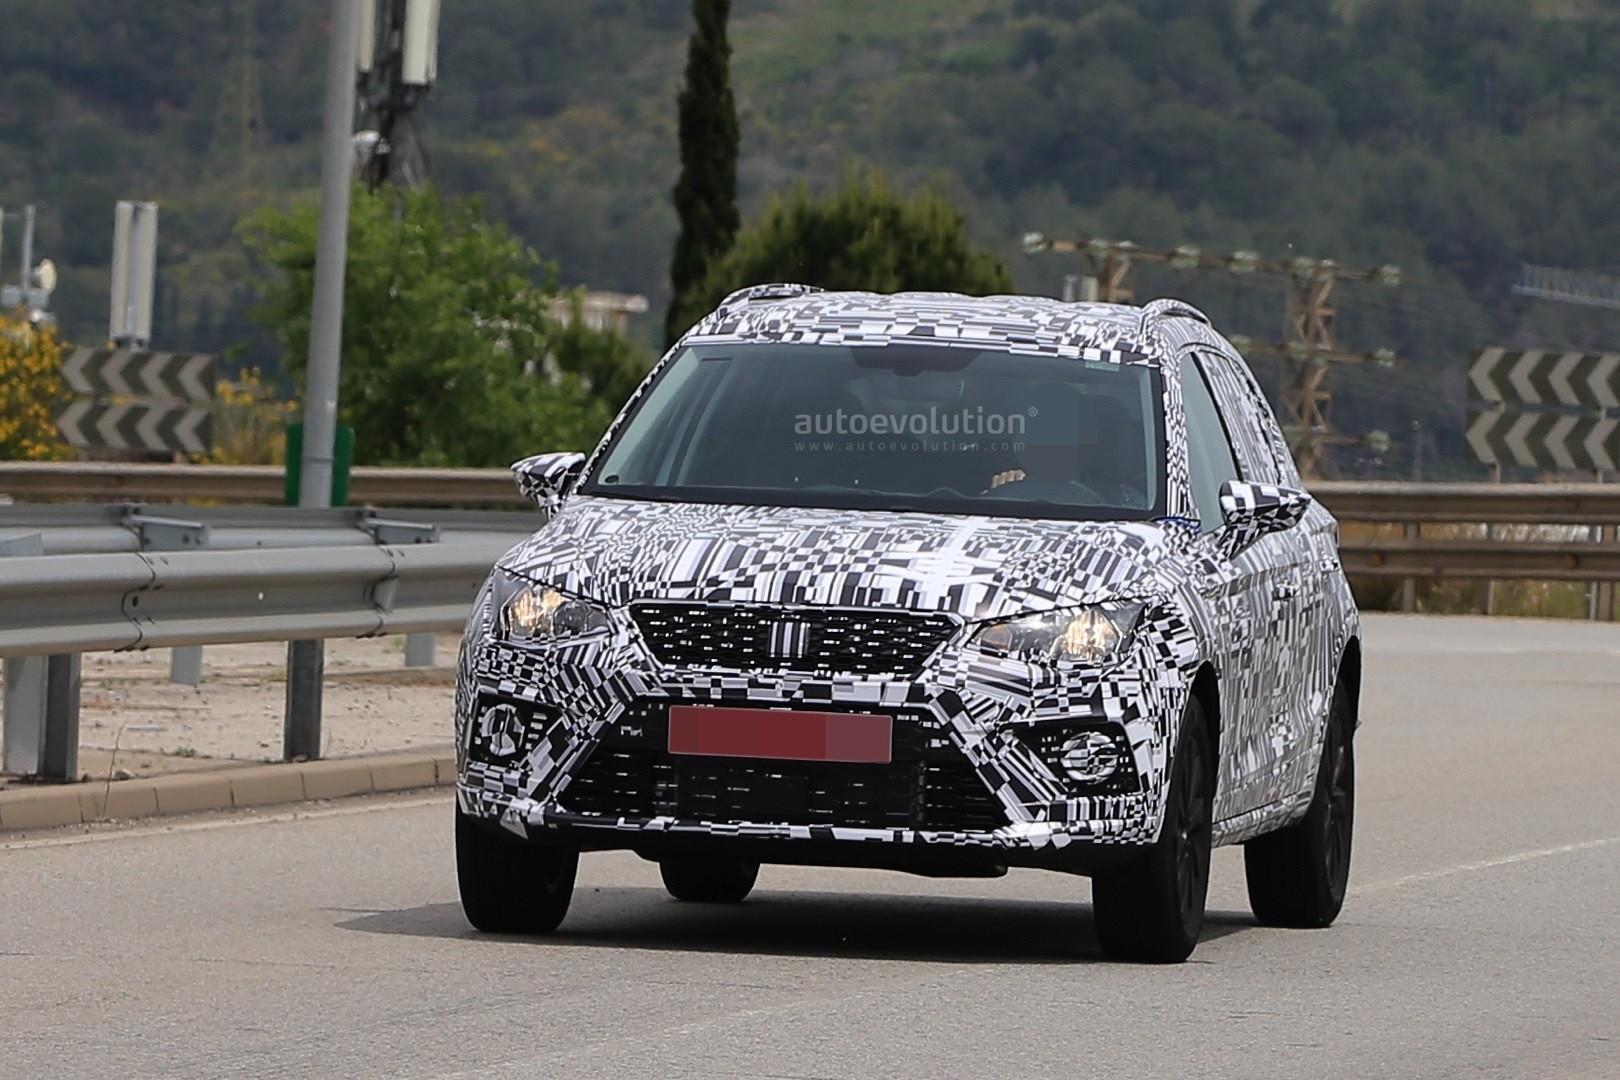 2018 SEAT Arona Spied Testing On Spanish Roads - autoevolution